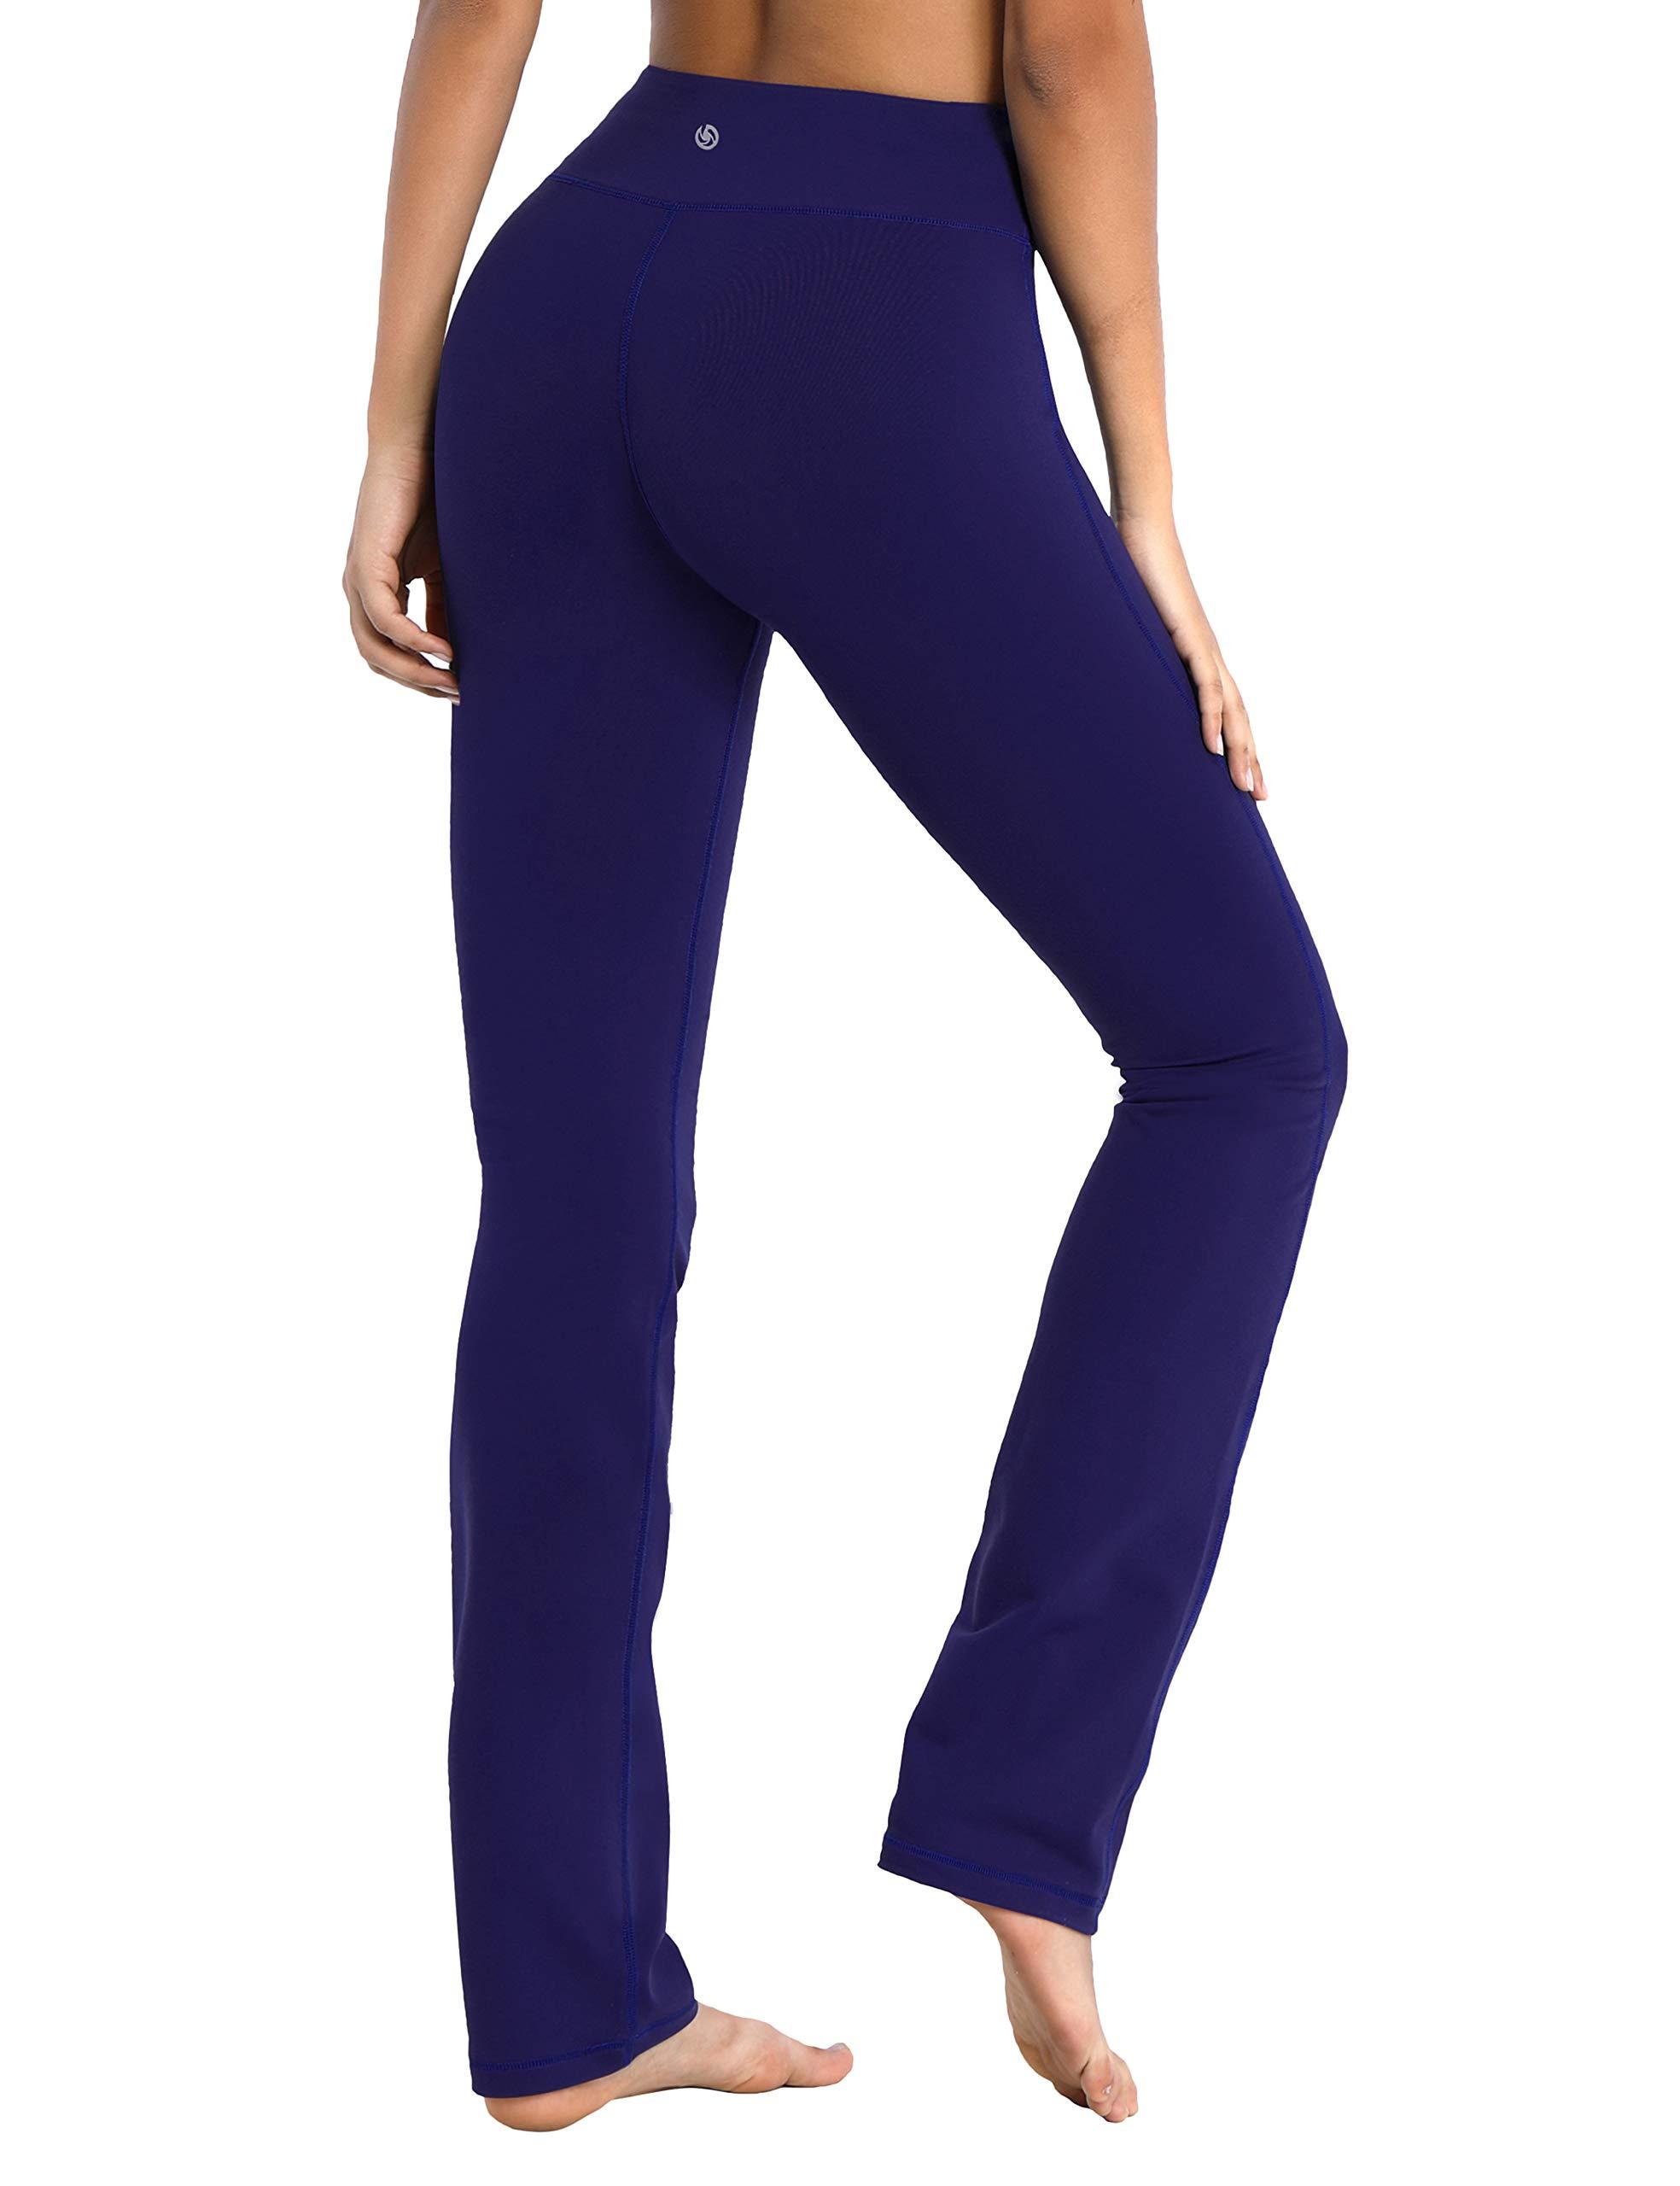 BUBBLELIME 29''/31''/33''/35'' Inseam Women's Straight Leg Yoga Pants Mid Waist Four Pockets Workout Leggings Moisture Wicking by BUBBLELIME